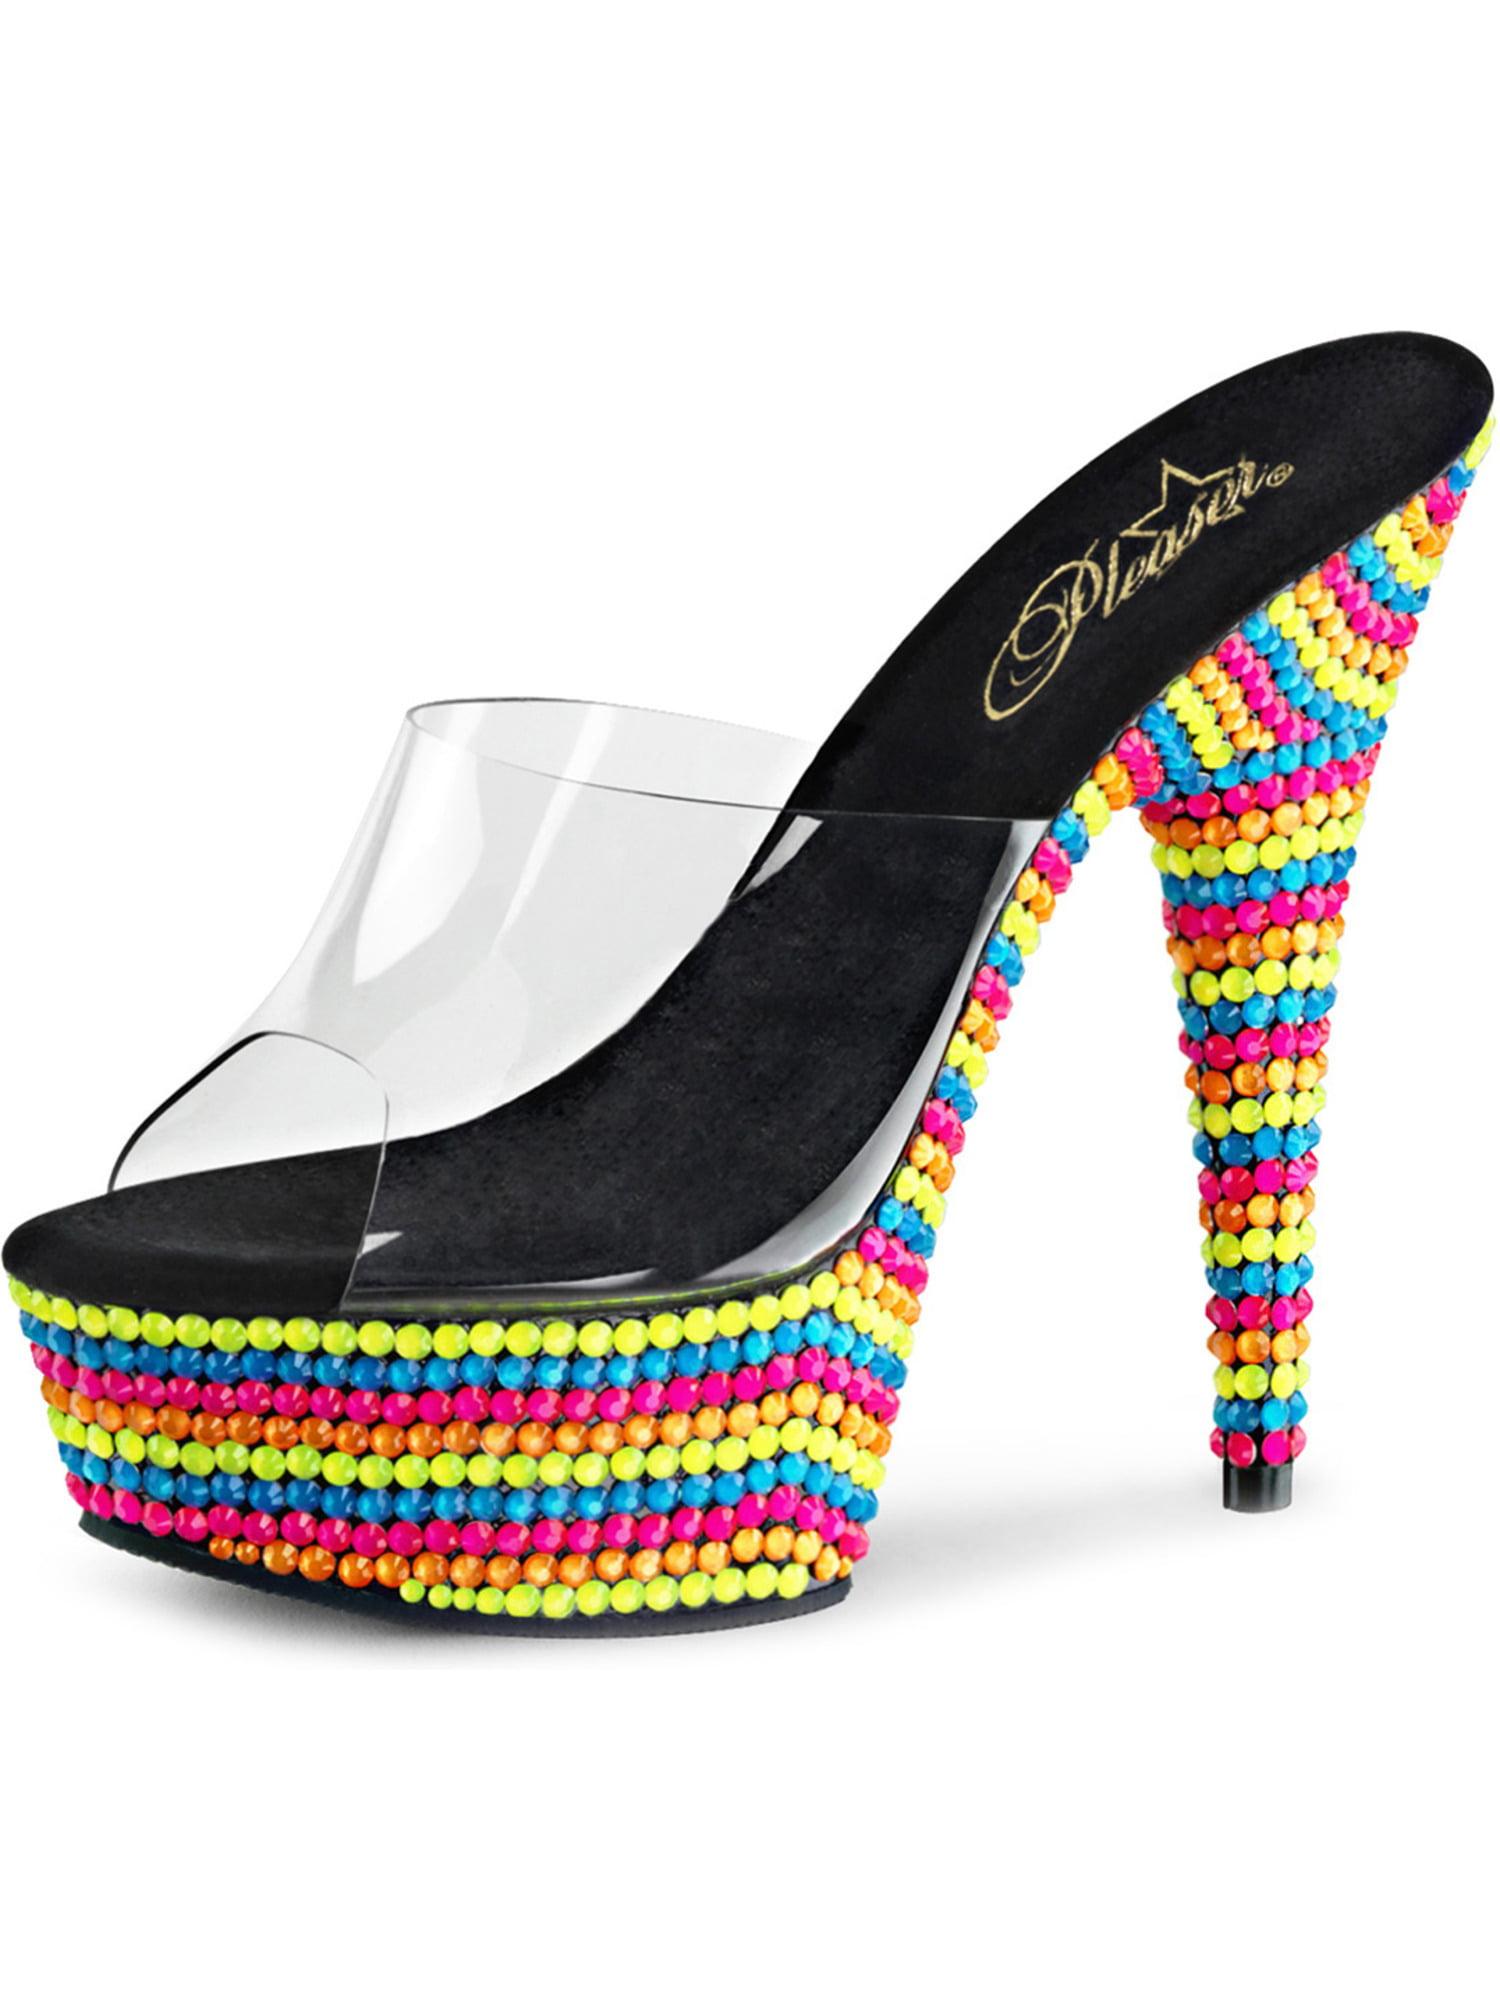 Womens Rainbow Sandals Neon UV Reactive Stones Platform Slides 6 Inch Heels